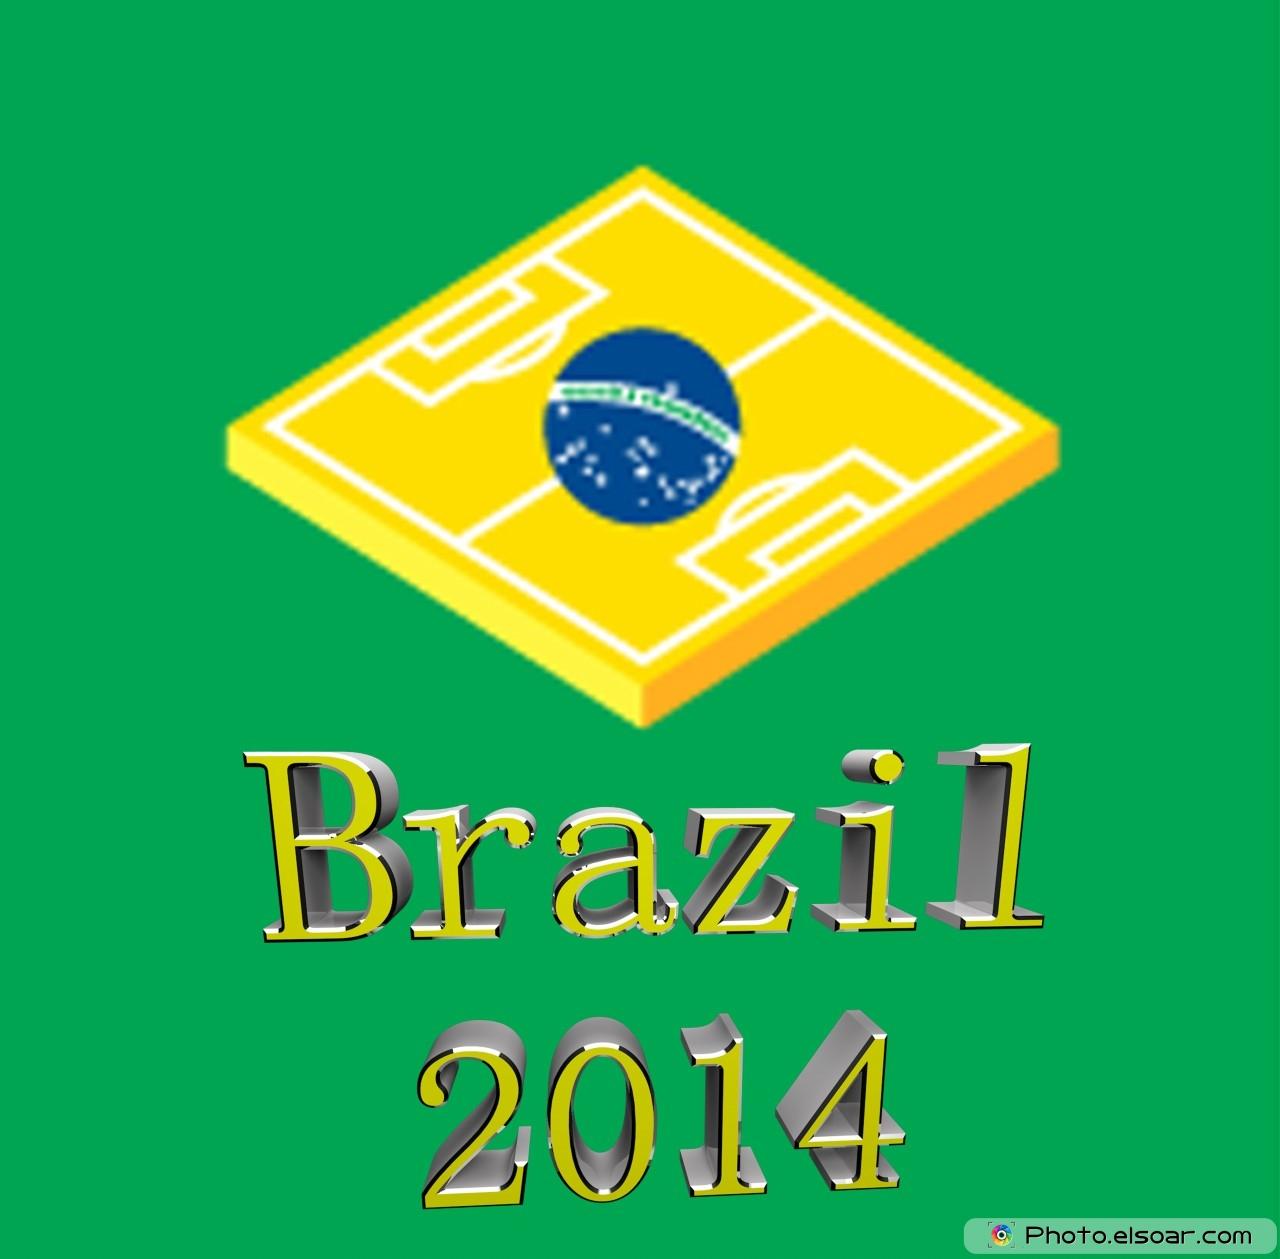 Brazilian flag included Brazil 2014